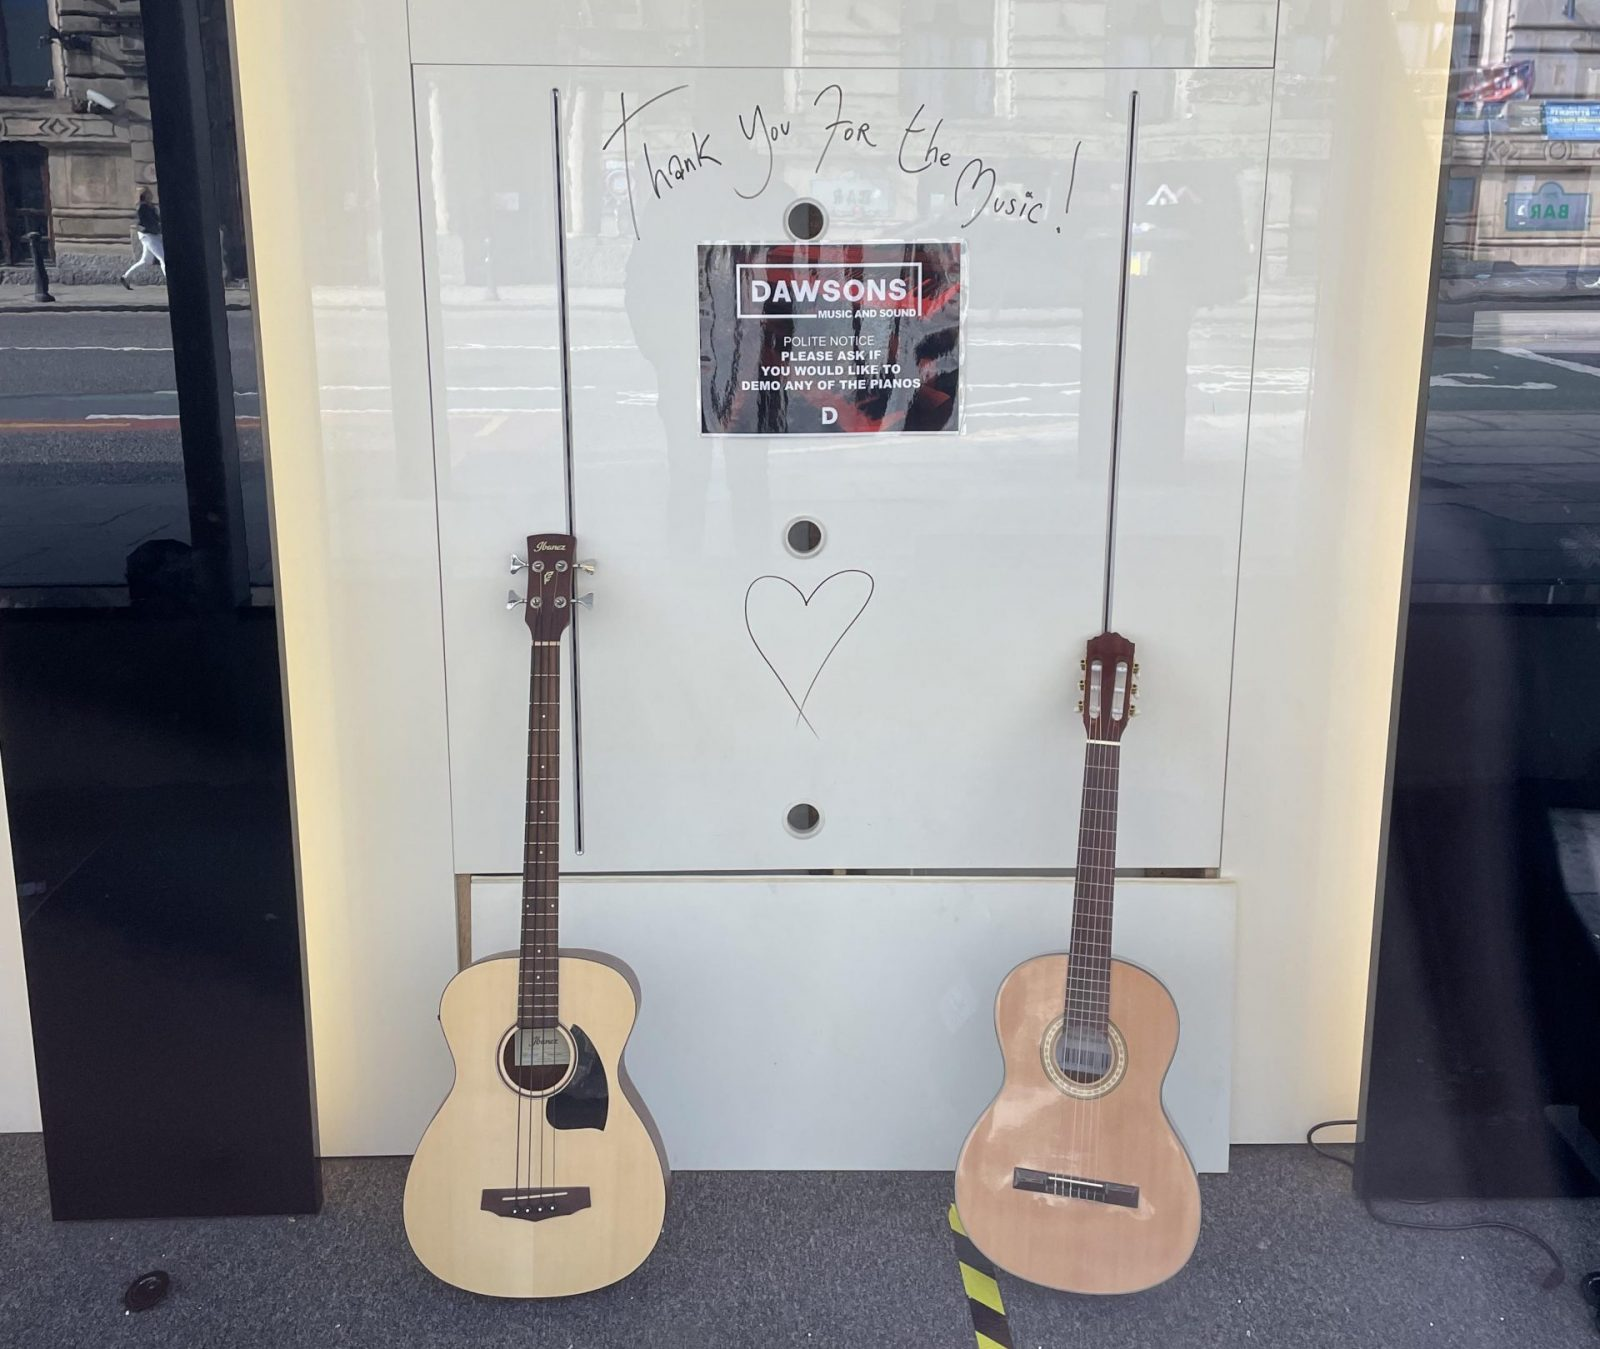 Dawsons Music on Portland Street has permanently closed, The Manc